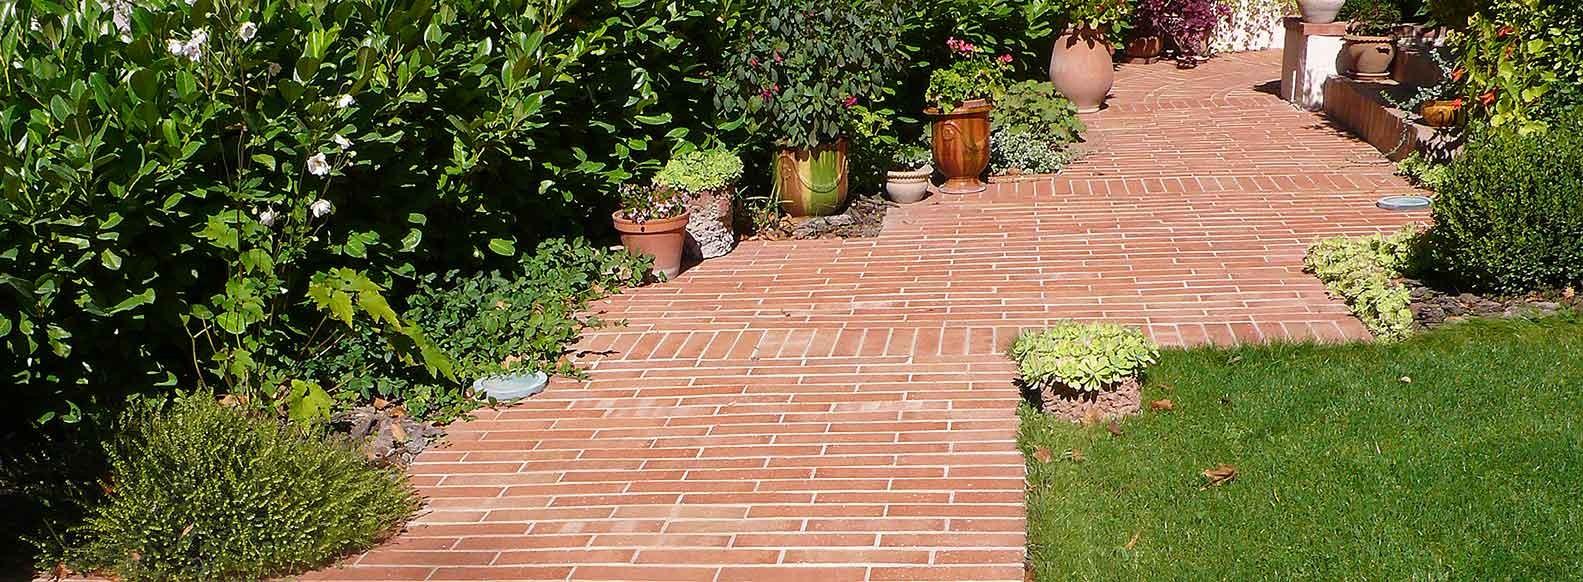 Crer une alle de jardin en briques de terre cuite  Terres Cuites de Raujolles